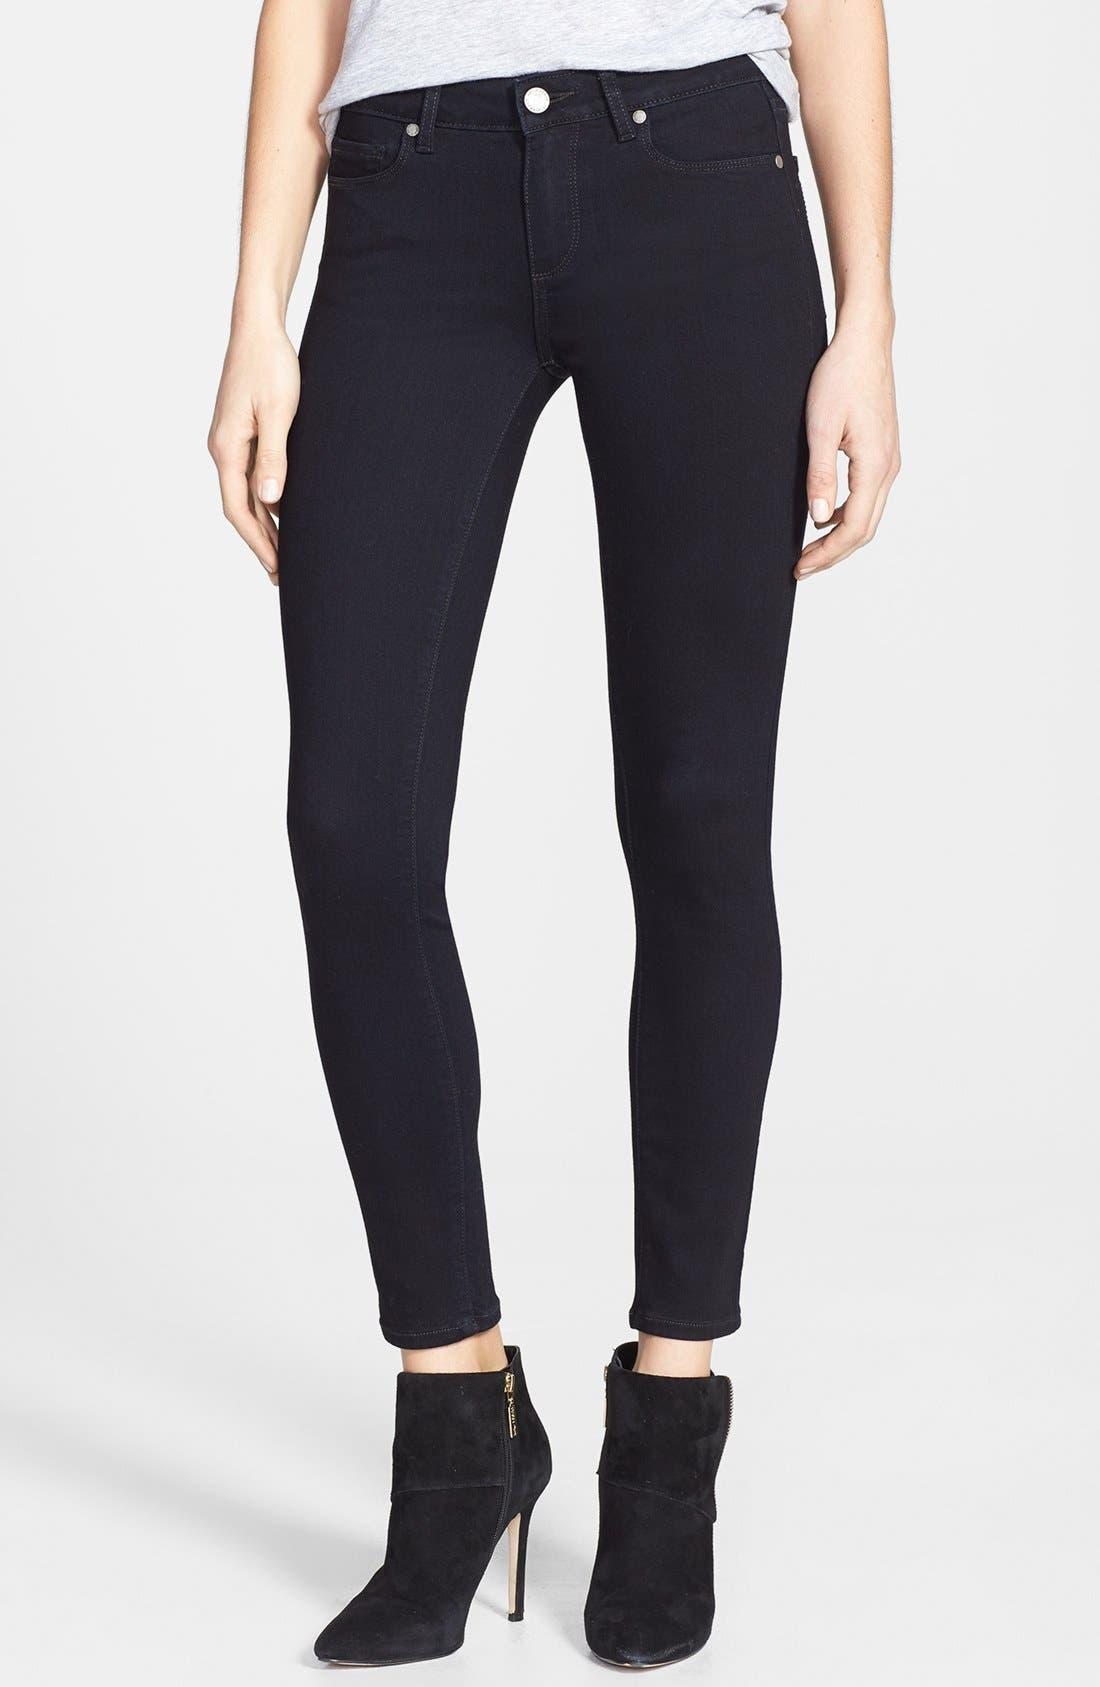 Main Image - Paige Denim 'Verdugo' Skinny Ankle Jeans (Kensington)